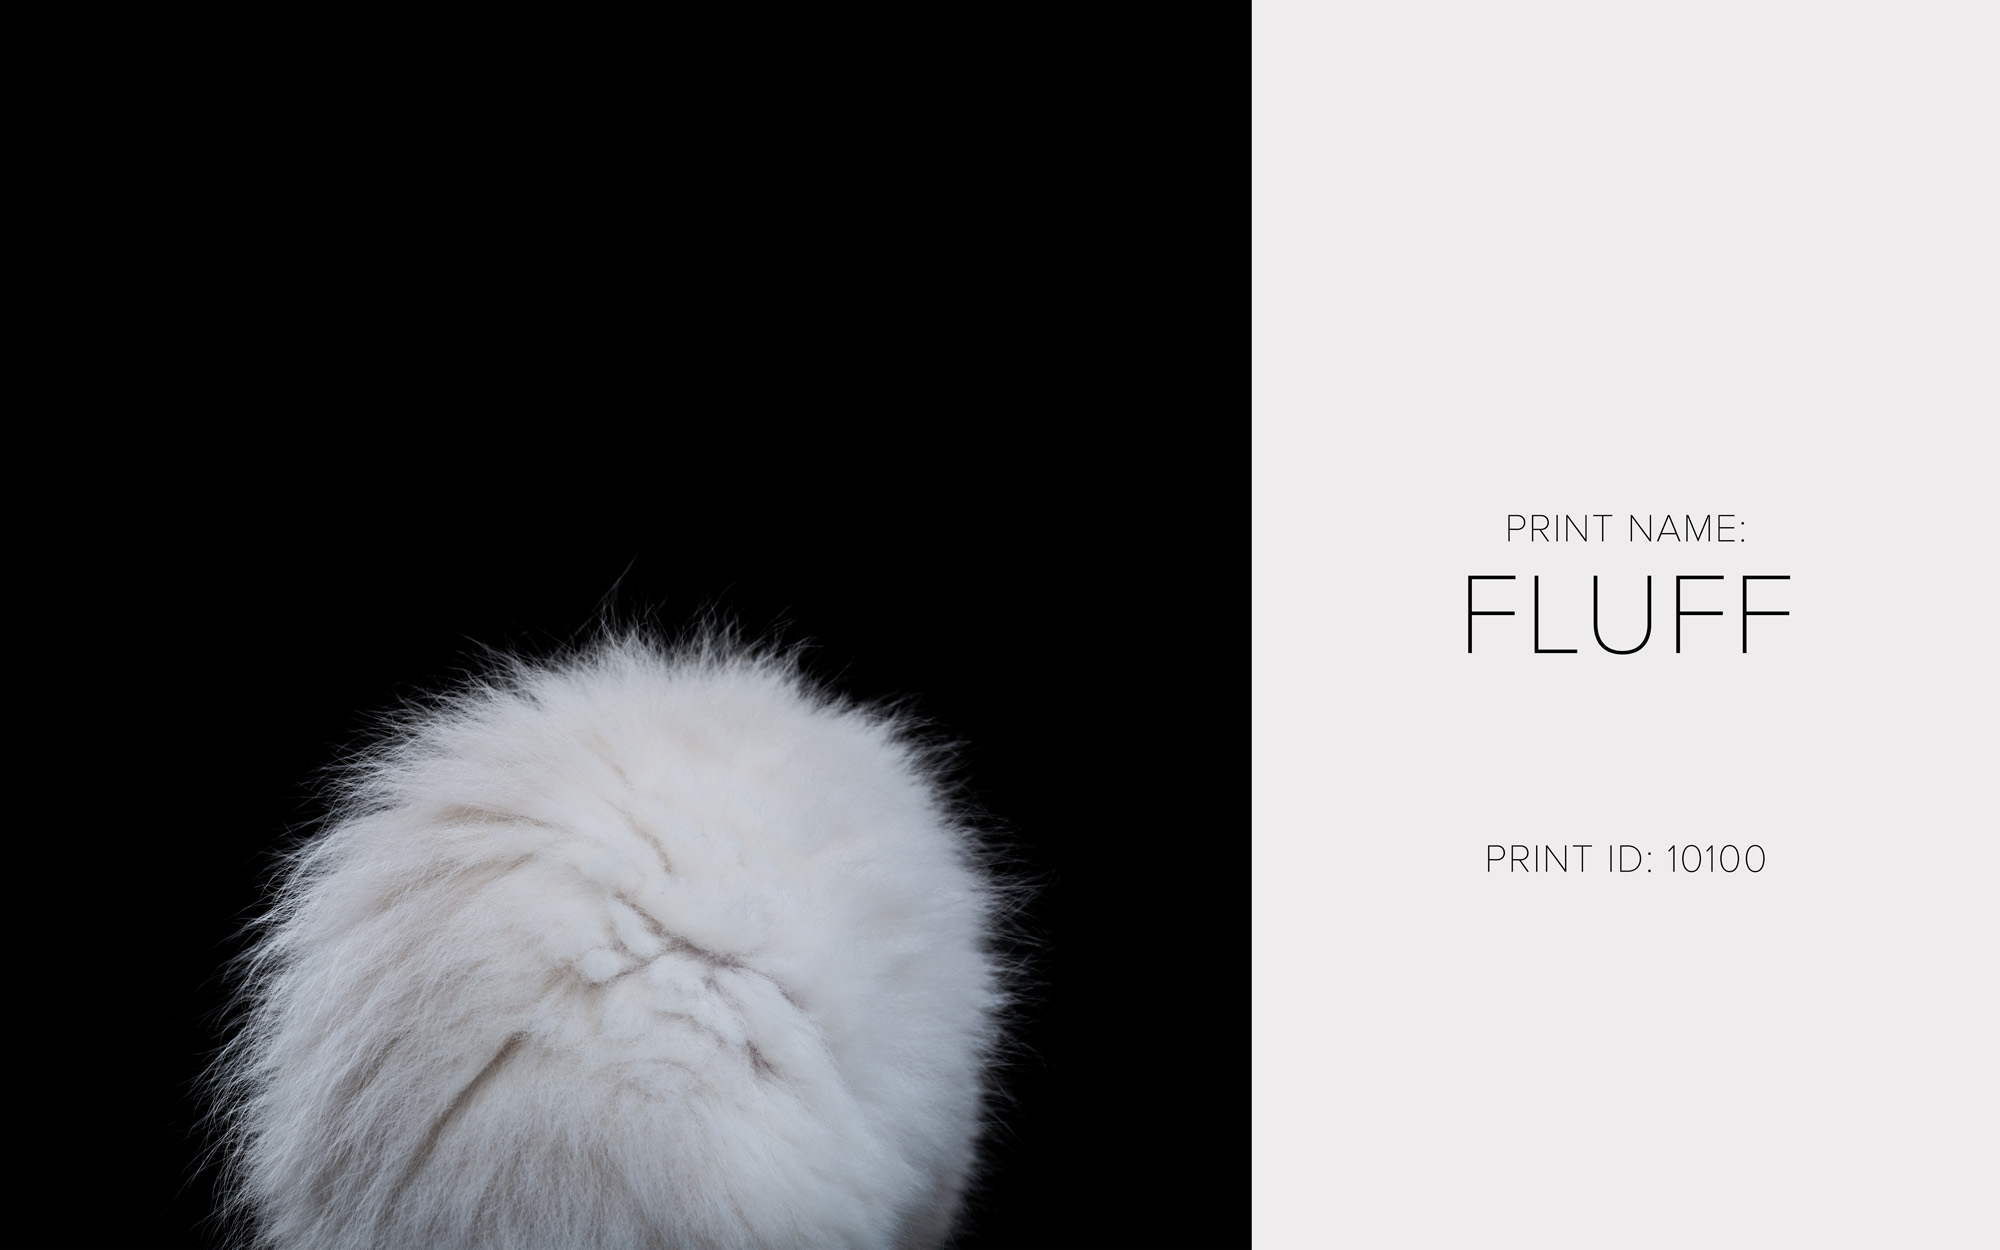 Fluff_Thumb.jpg